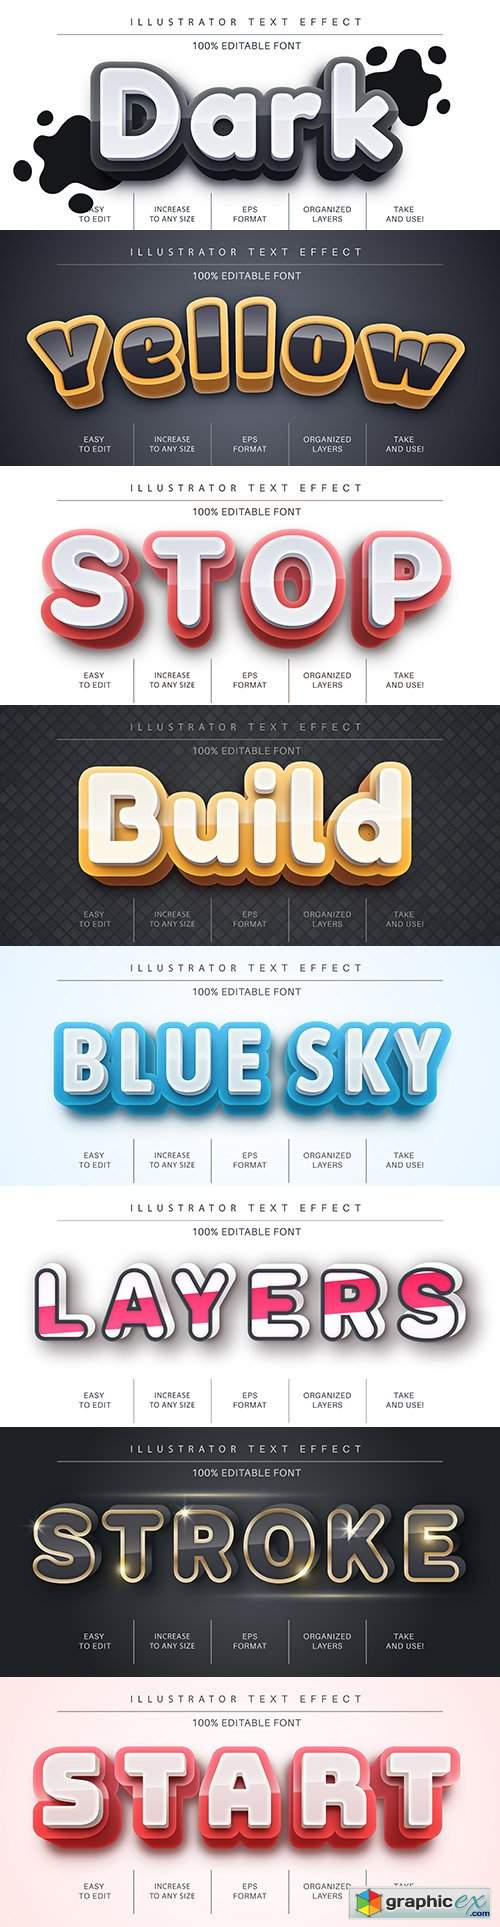 Editable font effect text collection illustration design 162